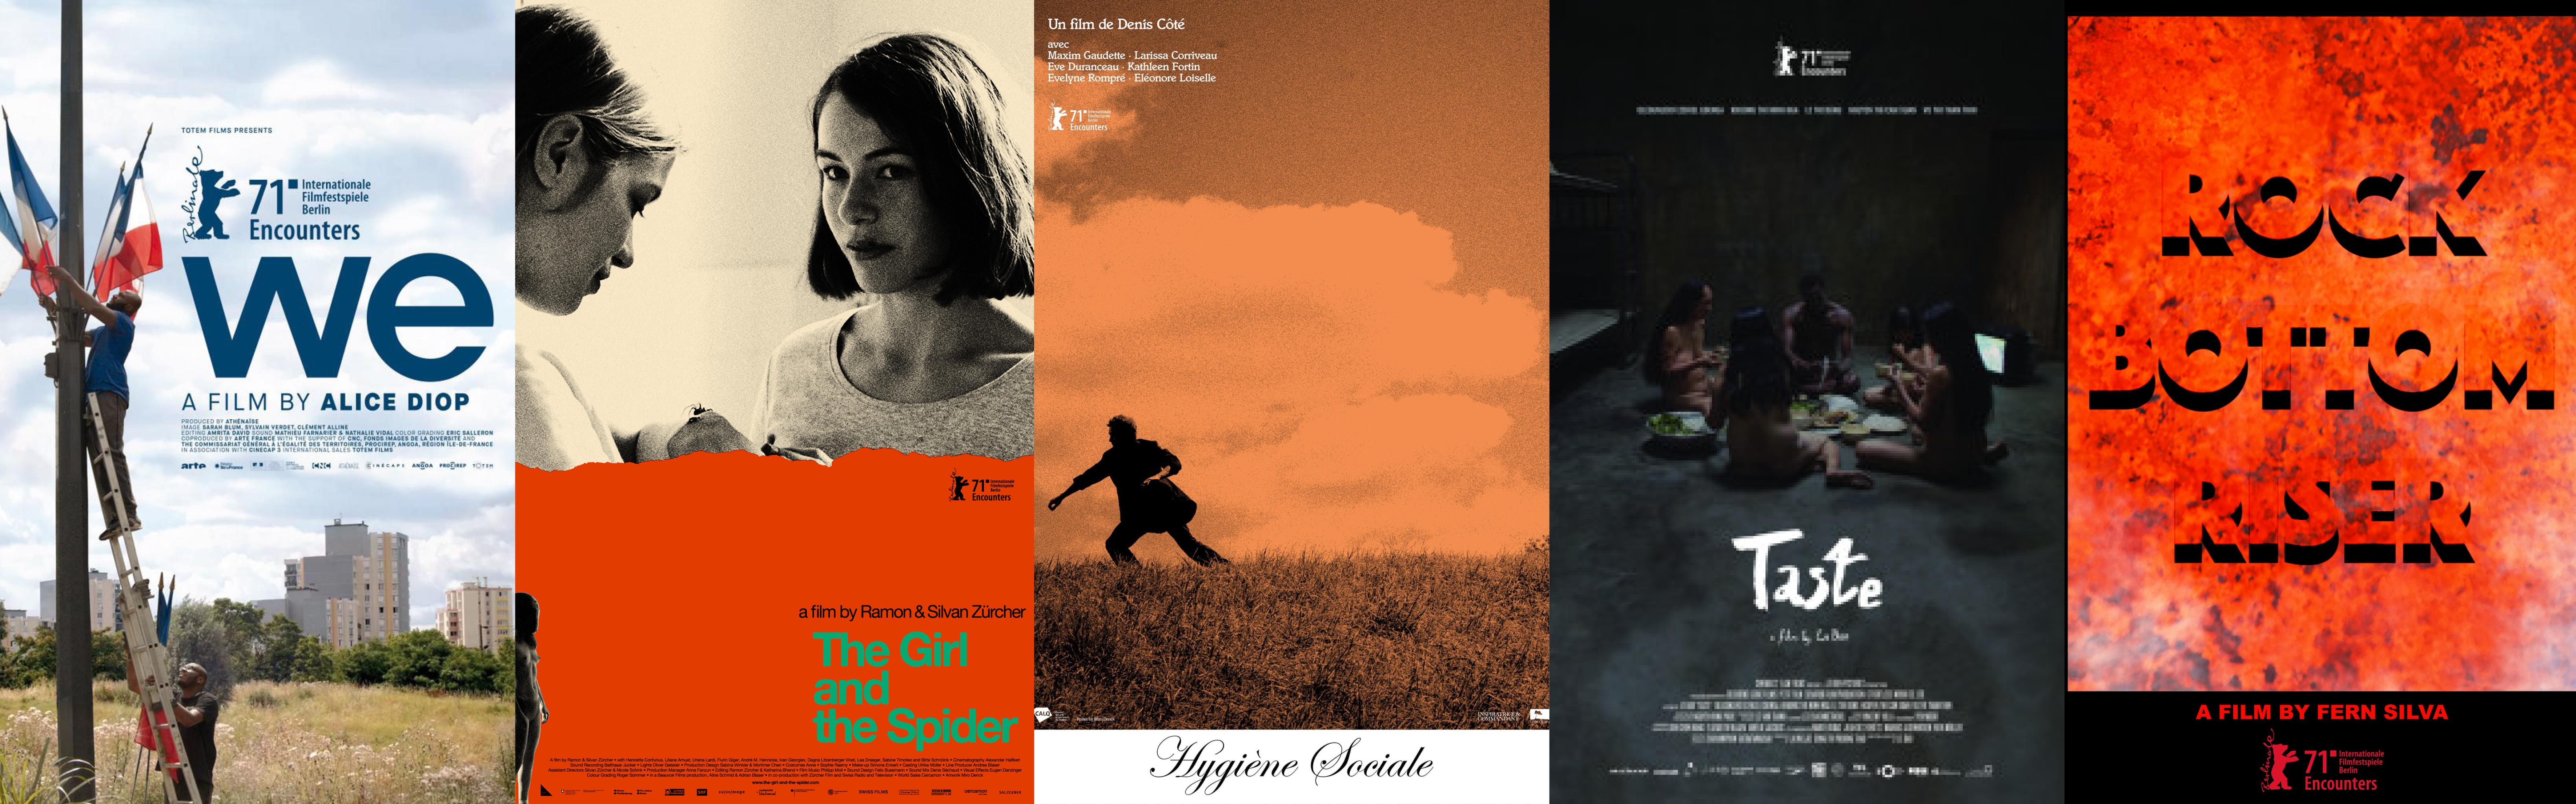 Berlinale - Encounters-1